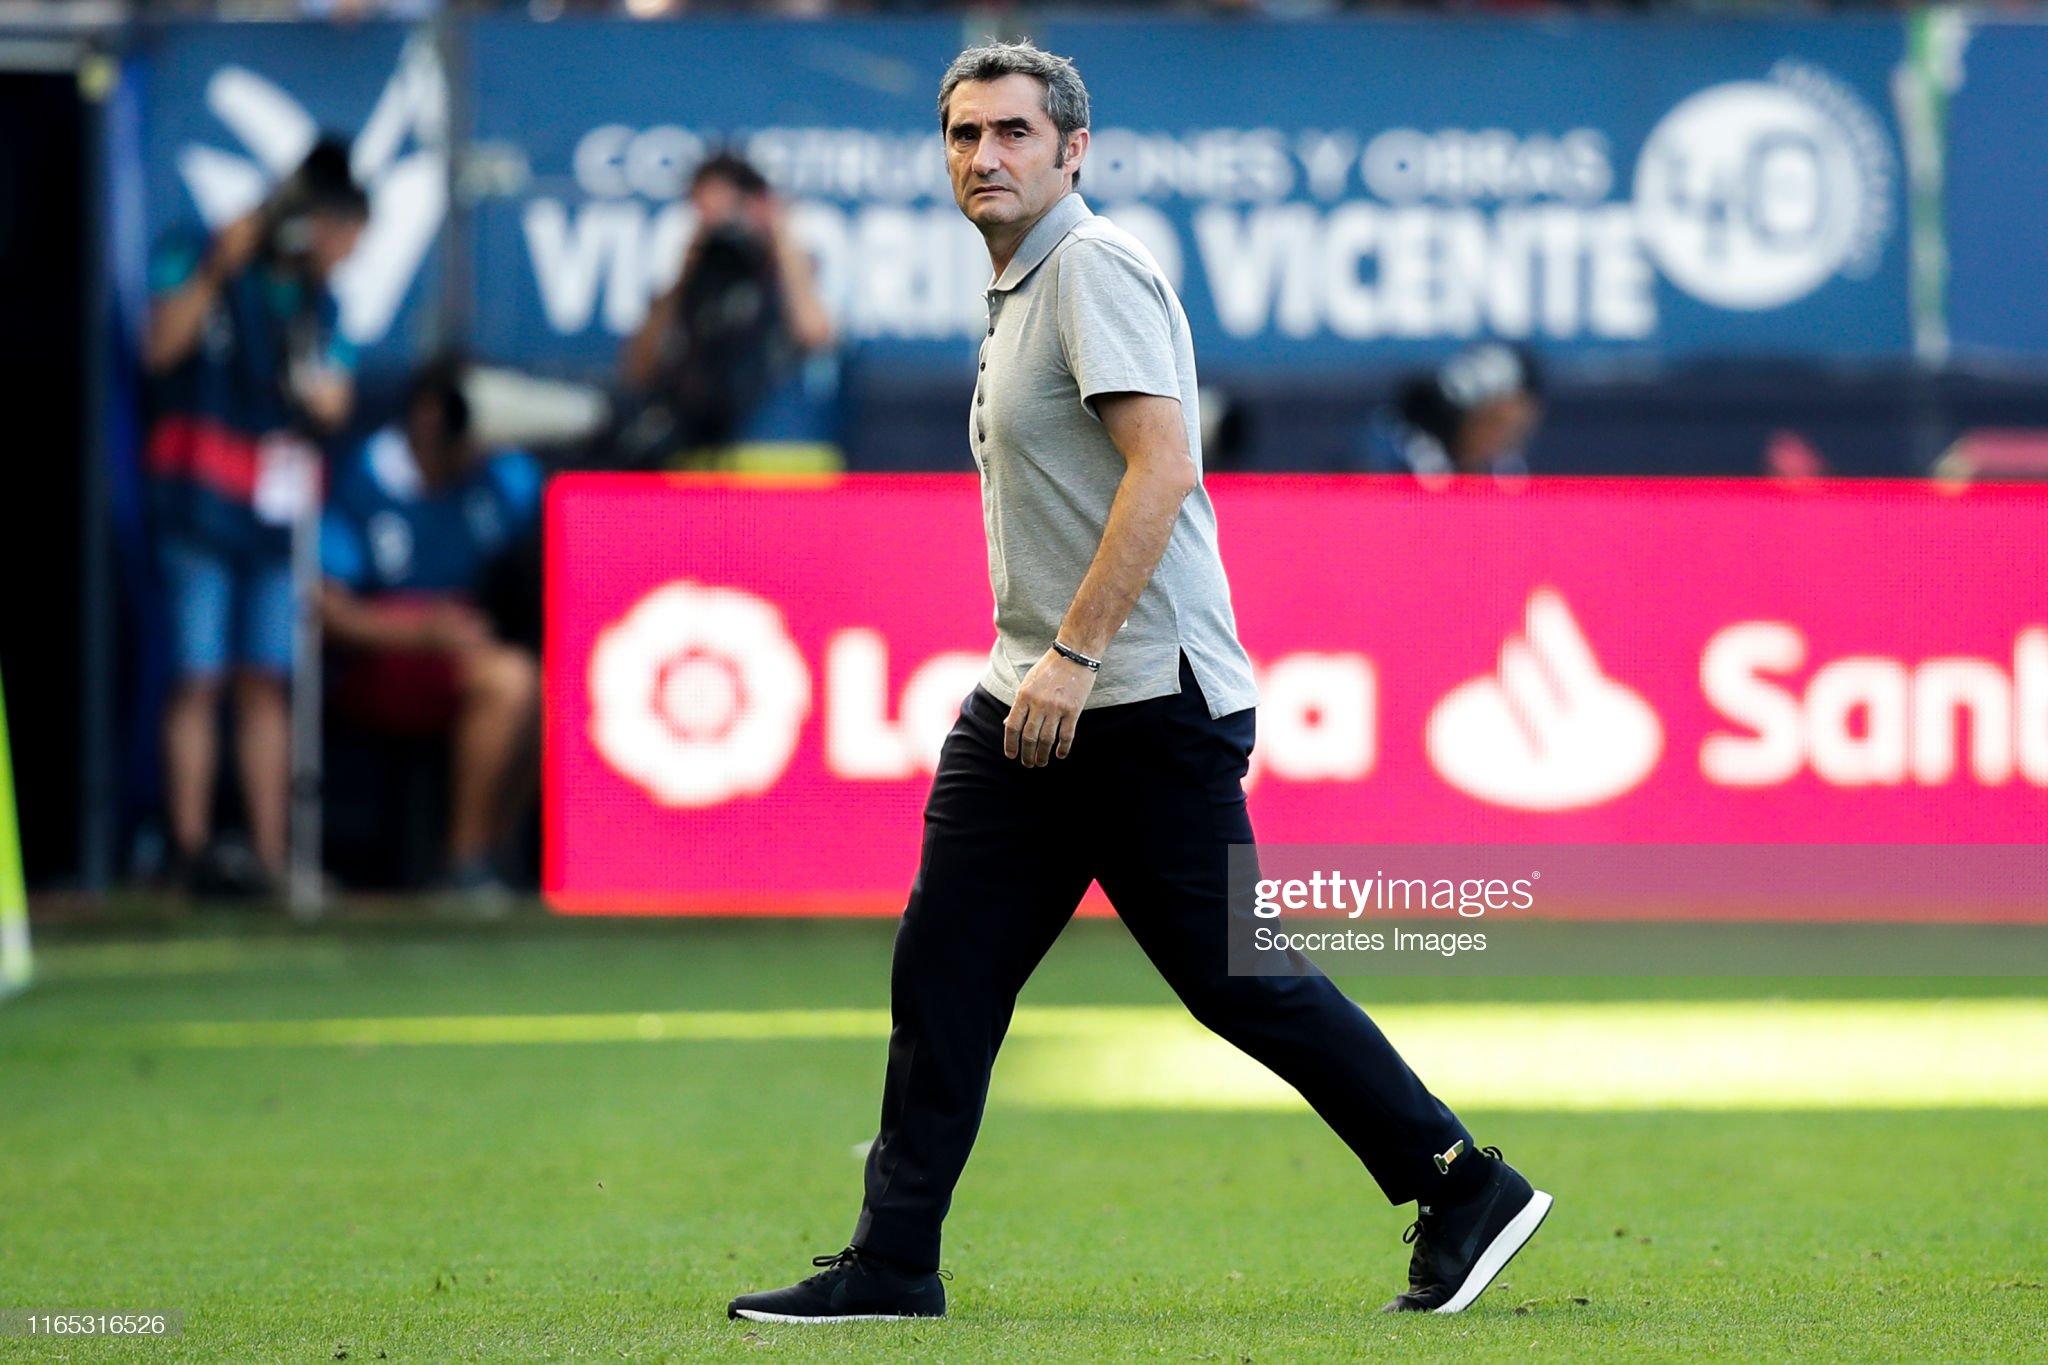 صور مباراة : أوساسونا - برشلونة 2-2 ( 31-08-2019 )  Coach-ernesto-valverde-of-fc-barcelona-during-the-la-liga-santander-picture-id1165316526?s=2048x2048